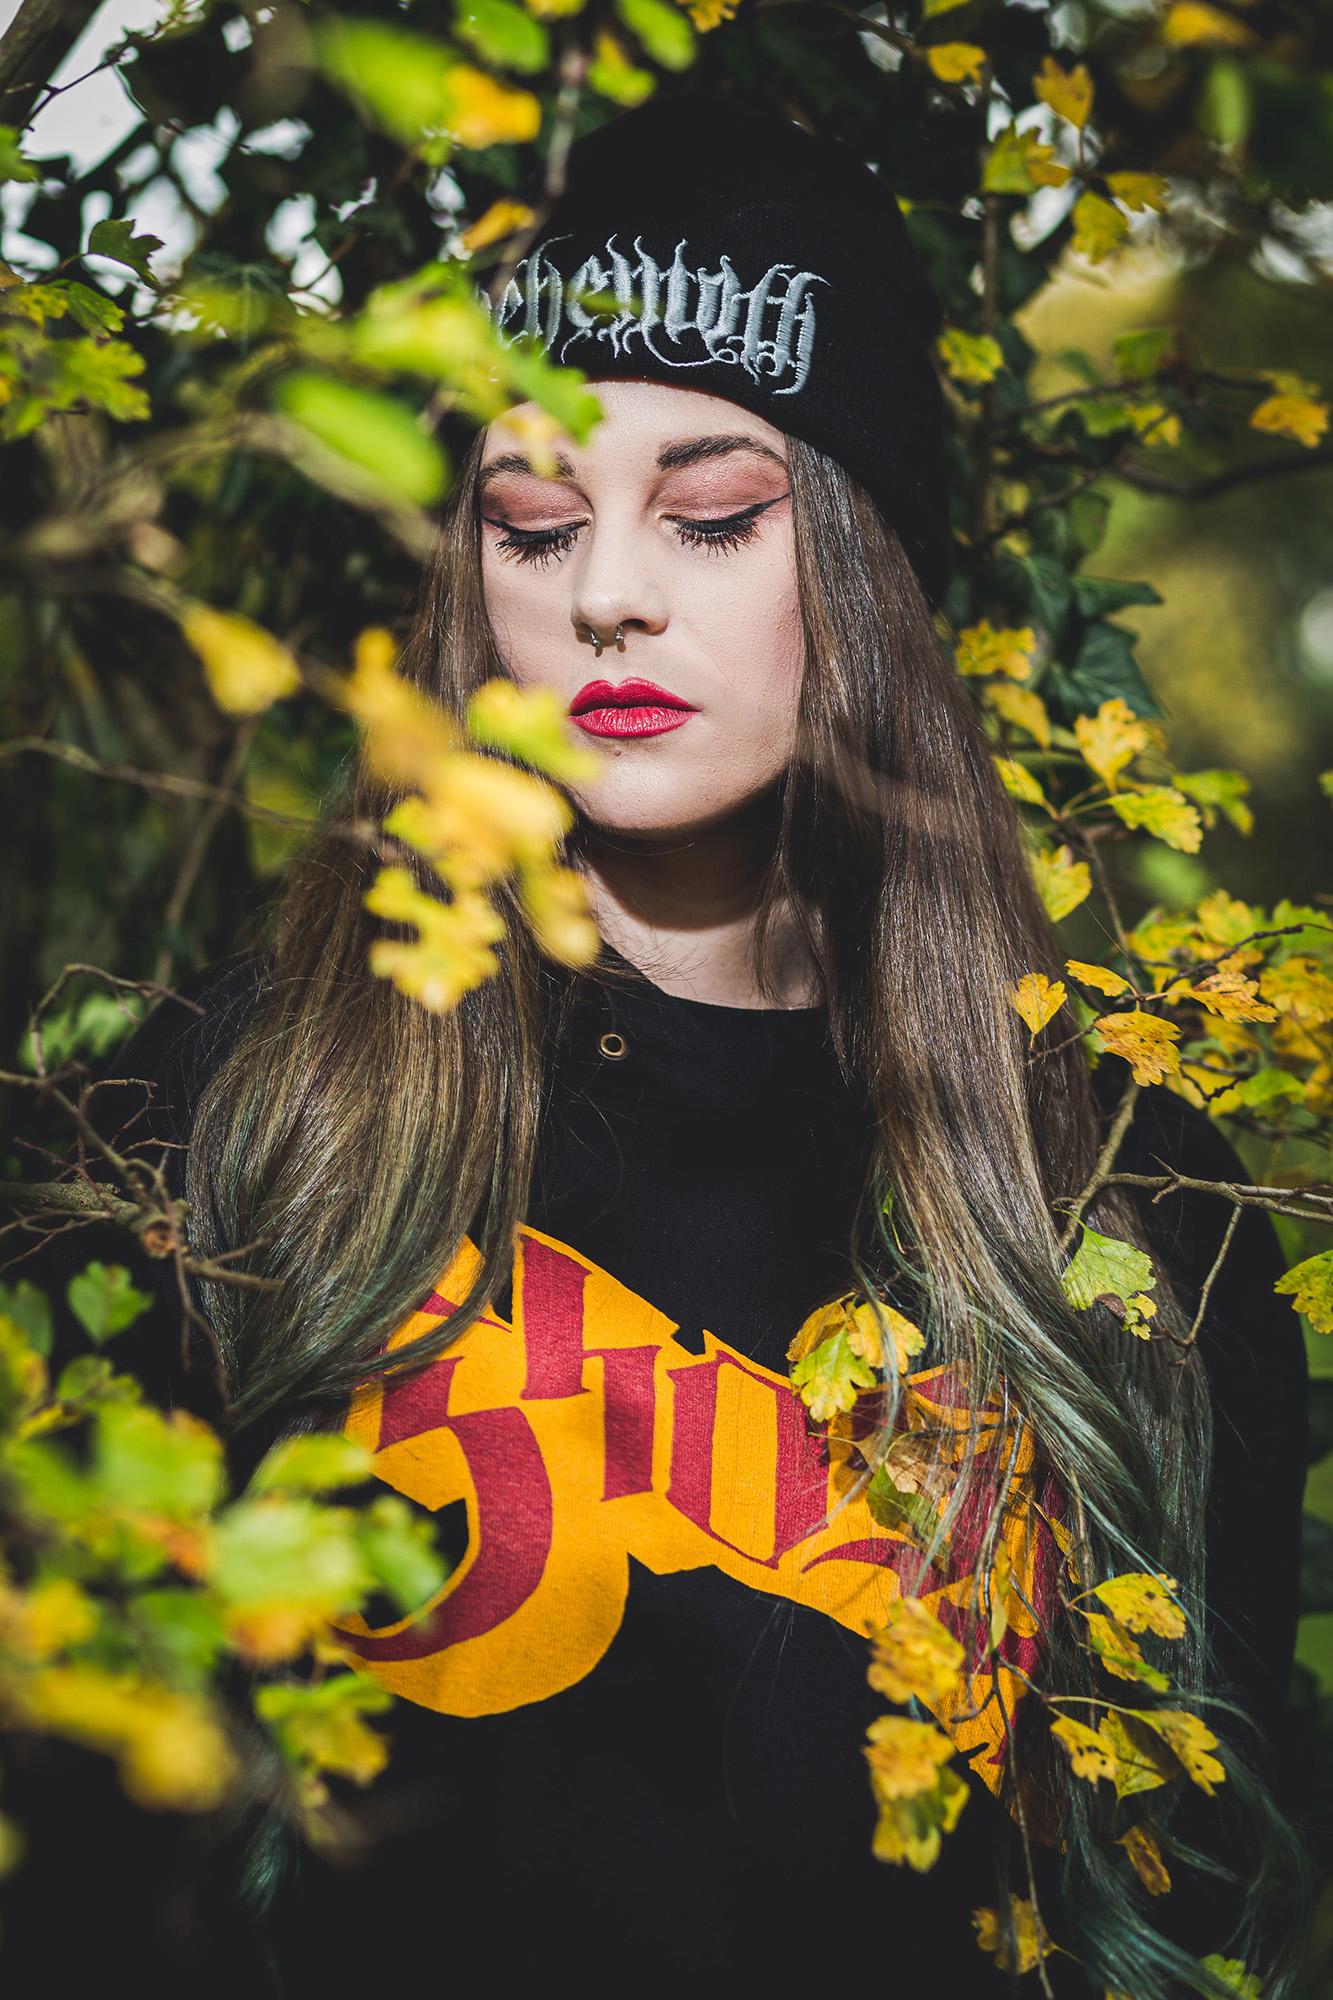 Model; Shooting; Fashion; Merch; Band; Bandwear; Urban Style; EMP